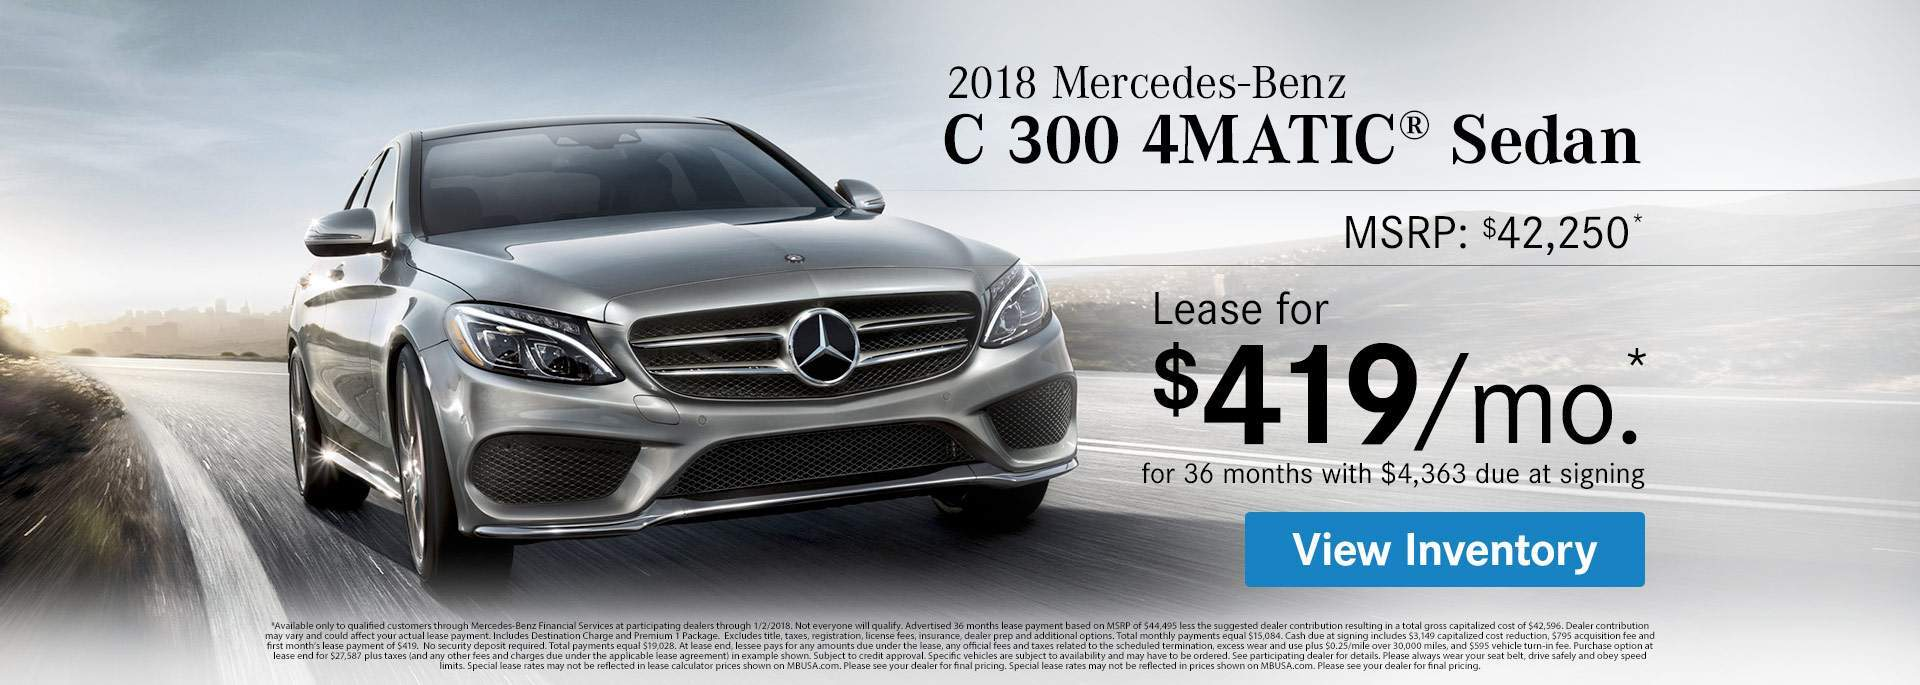 Ford Dealership In Evansville Wisconsin >> World Wide Motors Inc Mercedes Benz Dealership | Autos Post